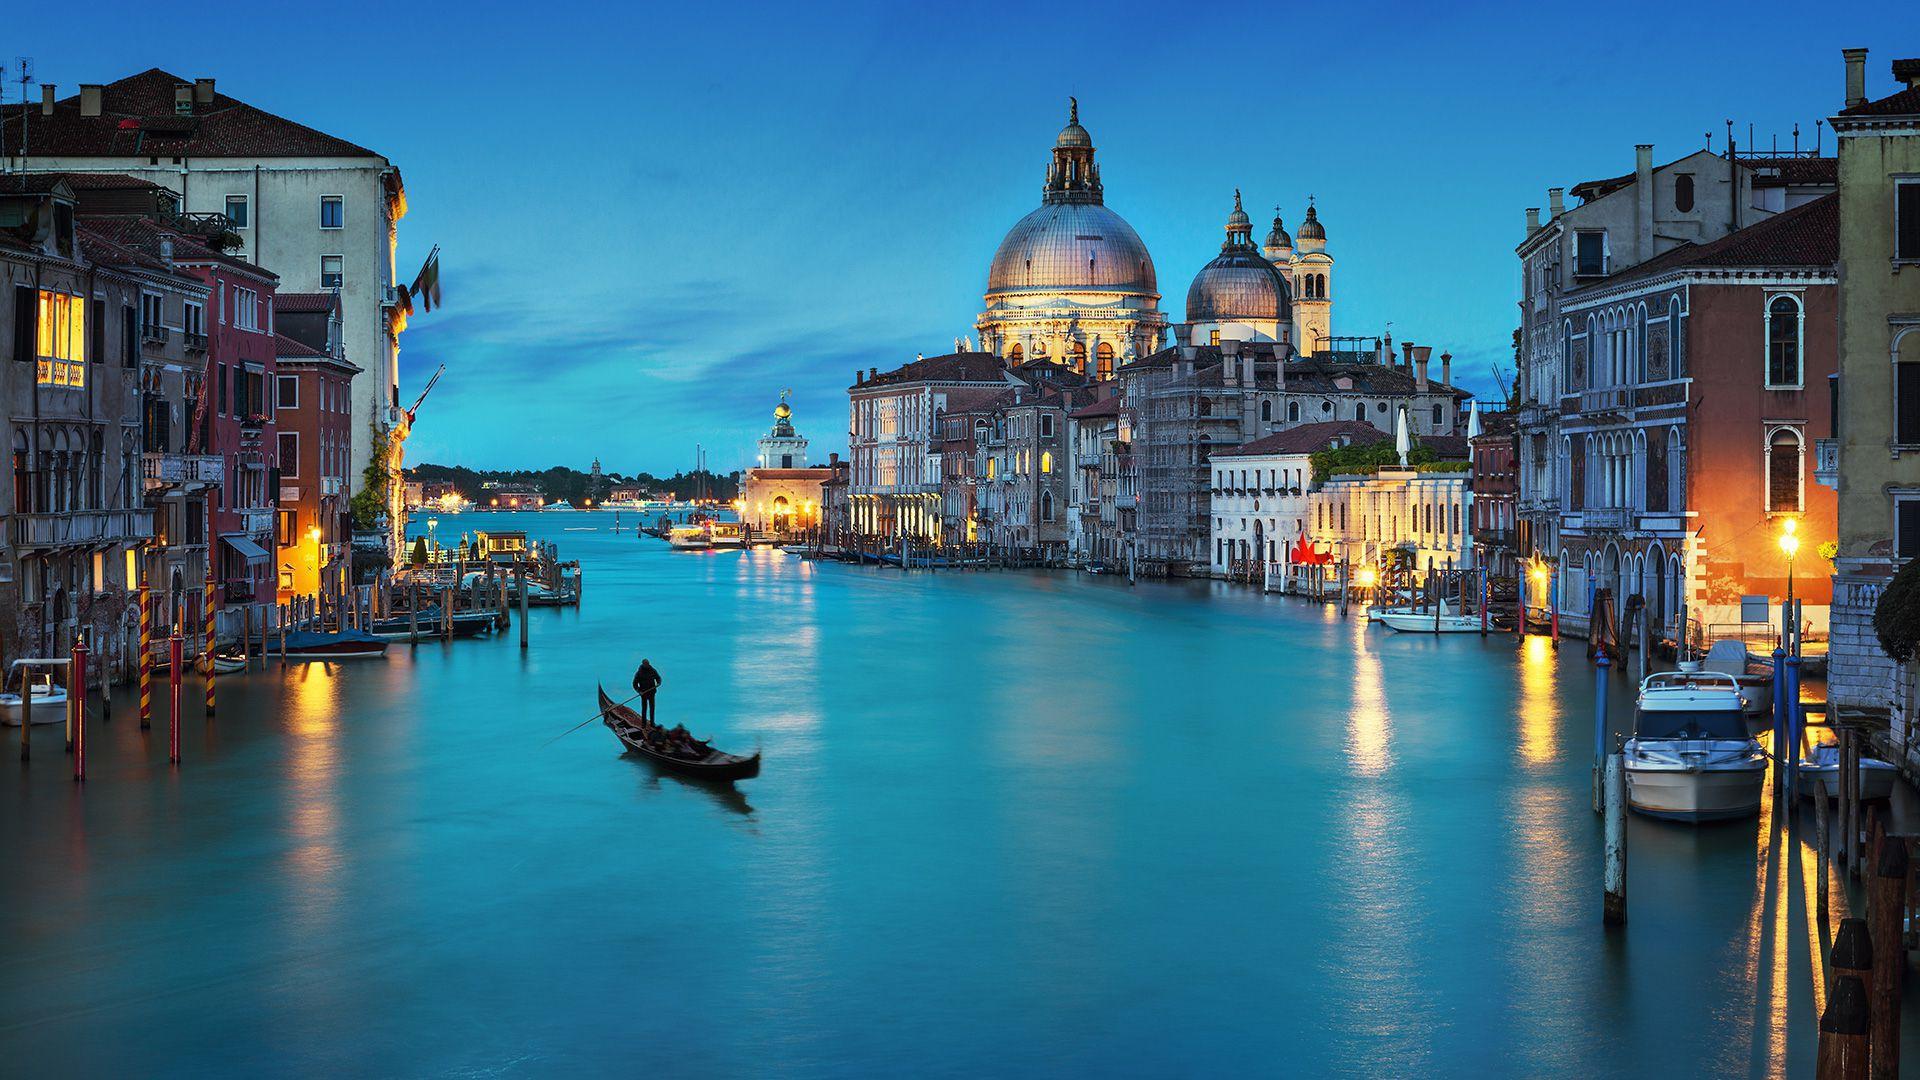 Venice Computer Backgrounds